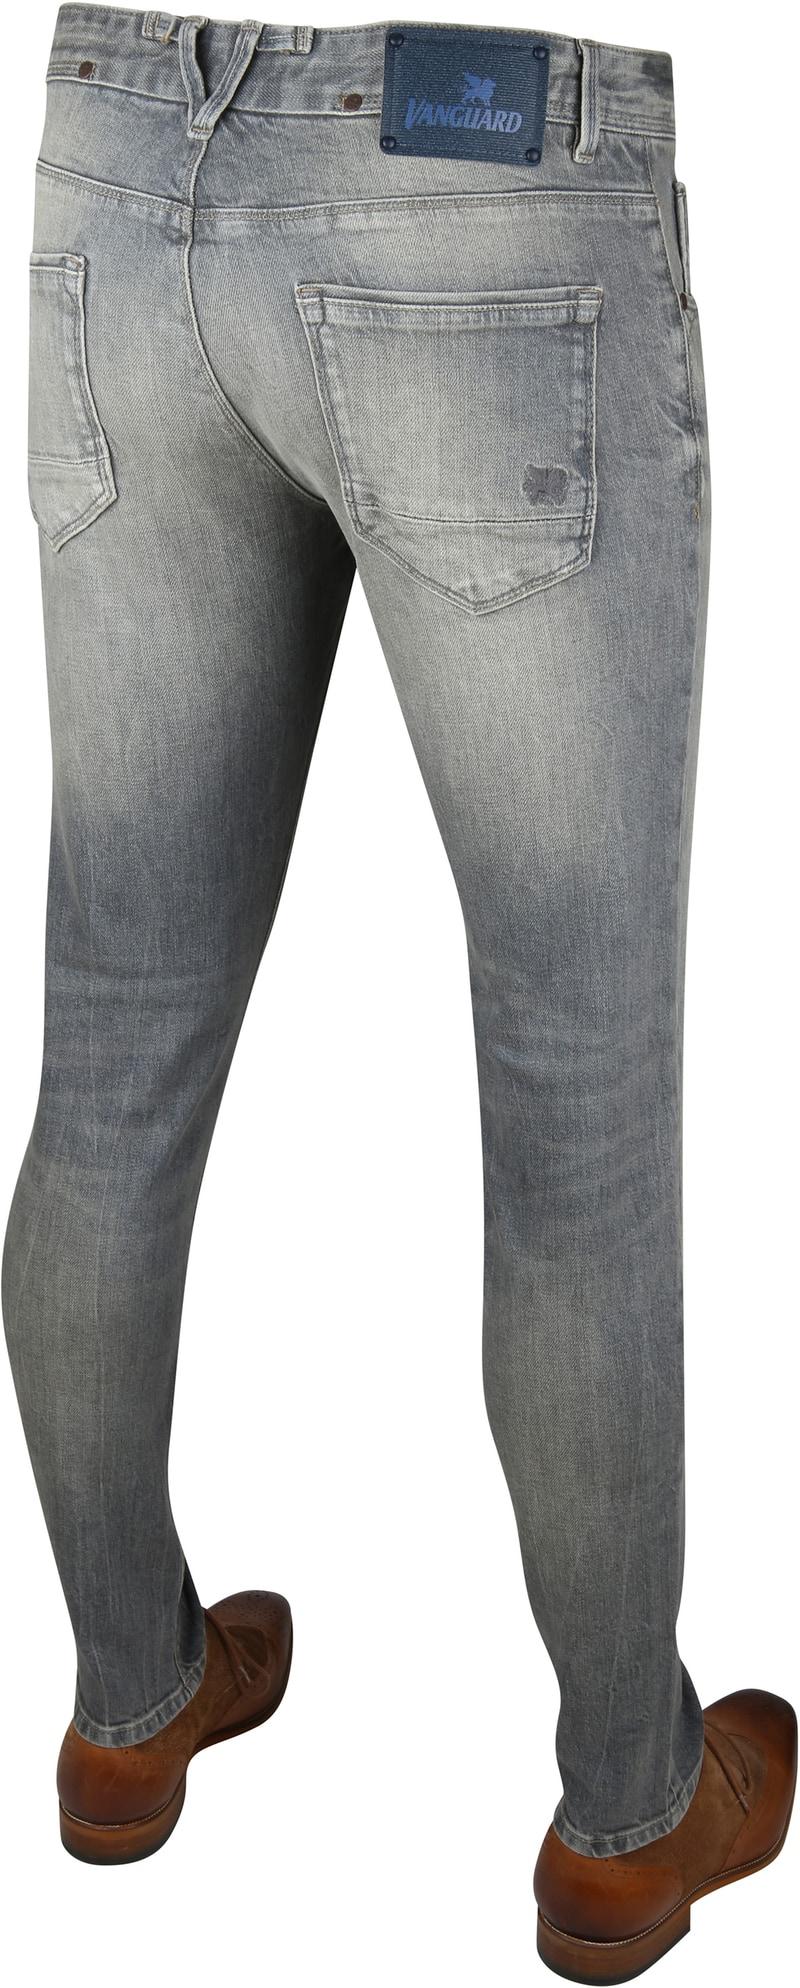 Vanguard V7 Rider Jeans Grey Beige photo 3